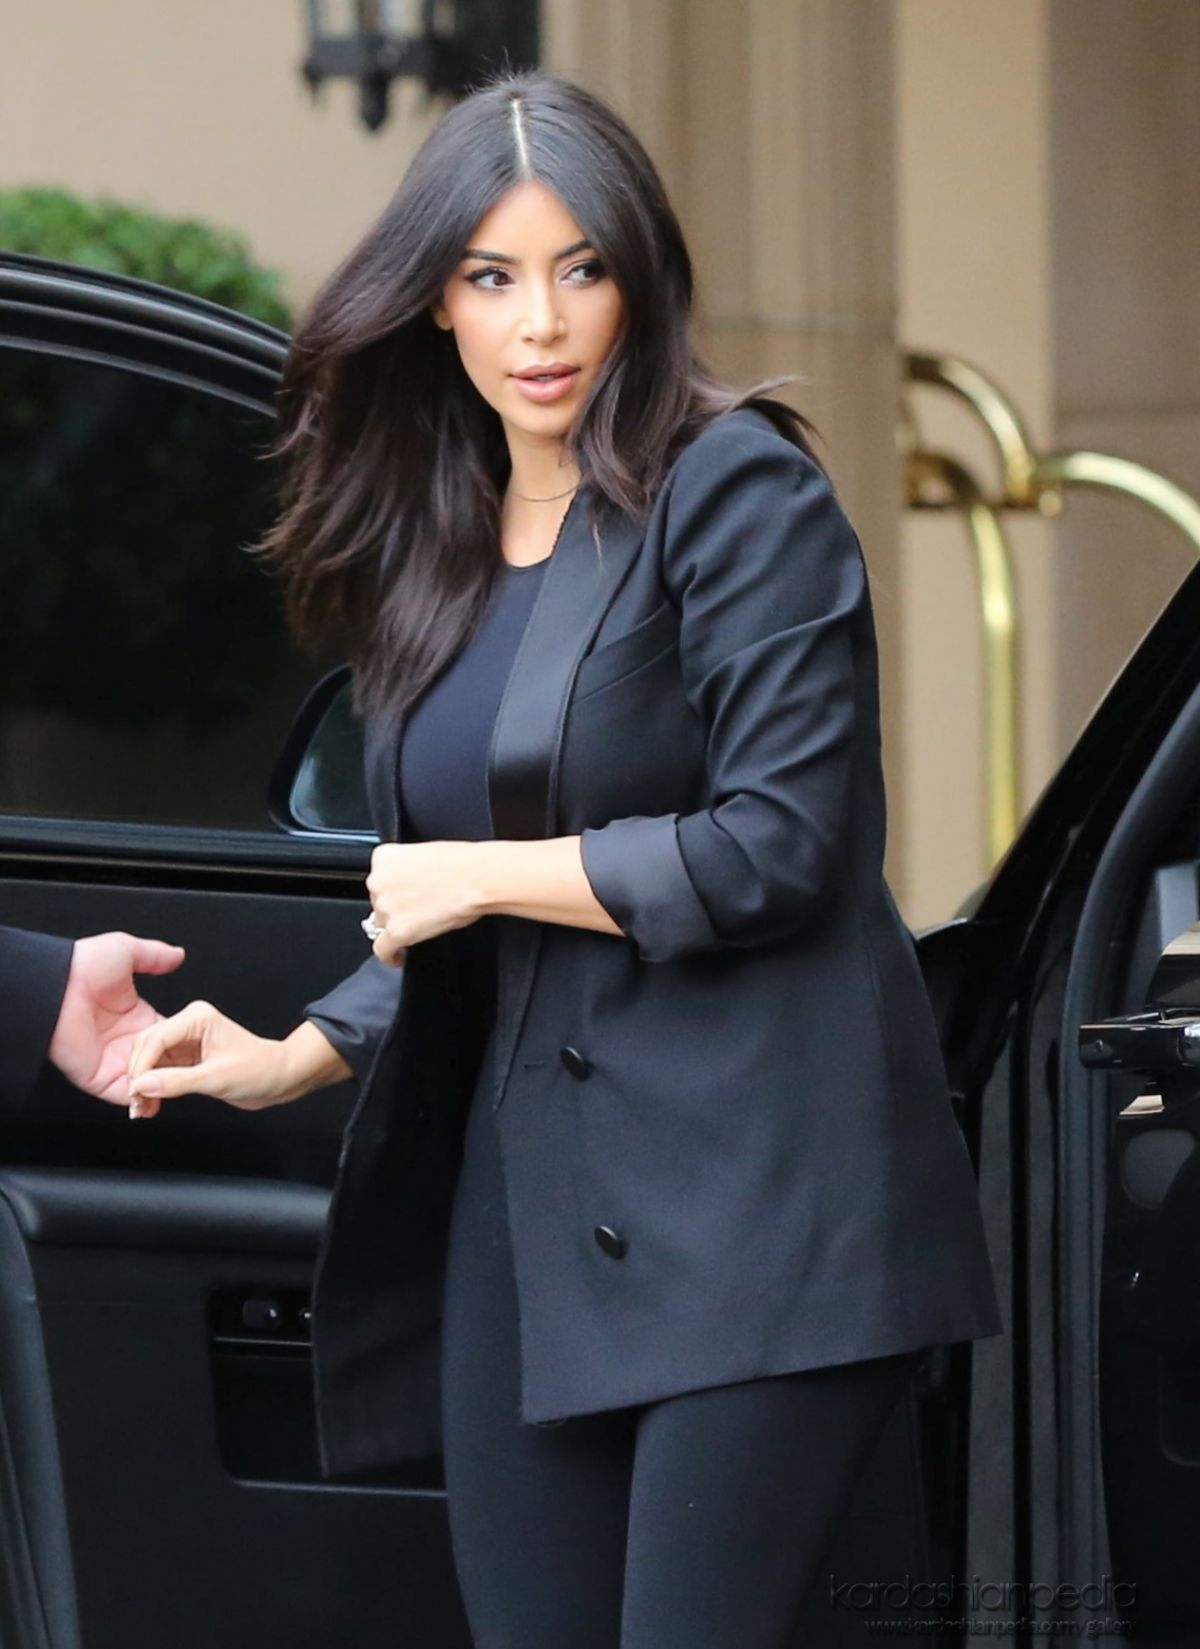 KIM KARDASHIAN Arrives at Khloe s Baby Shower in Beverly Hills